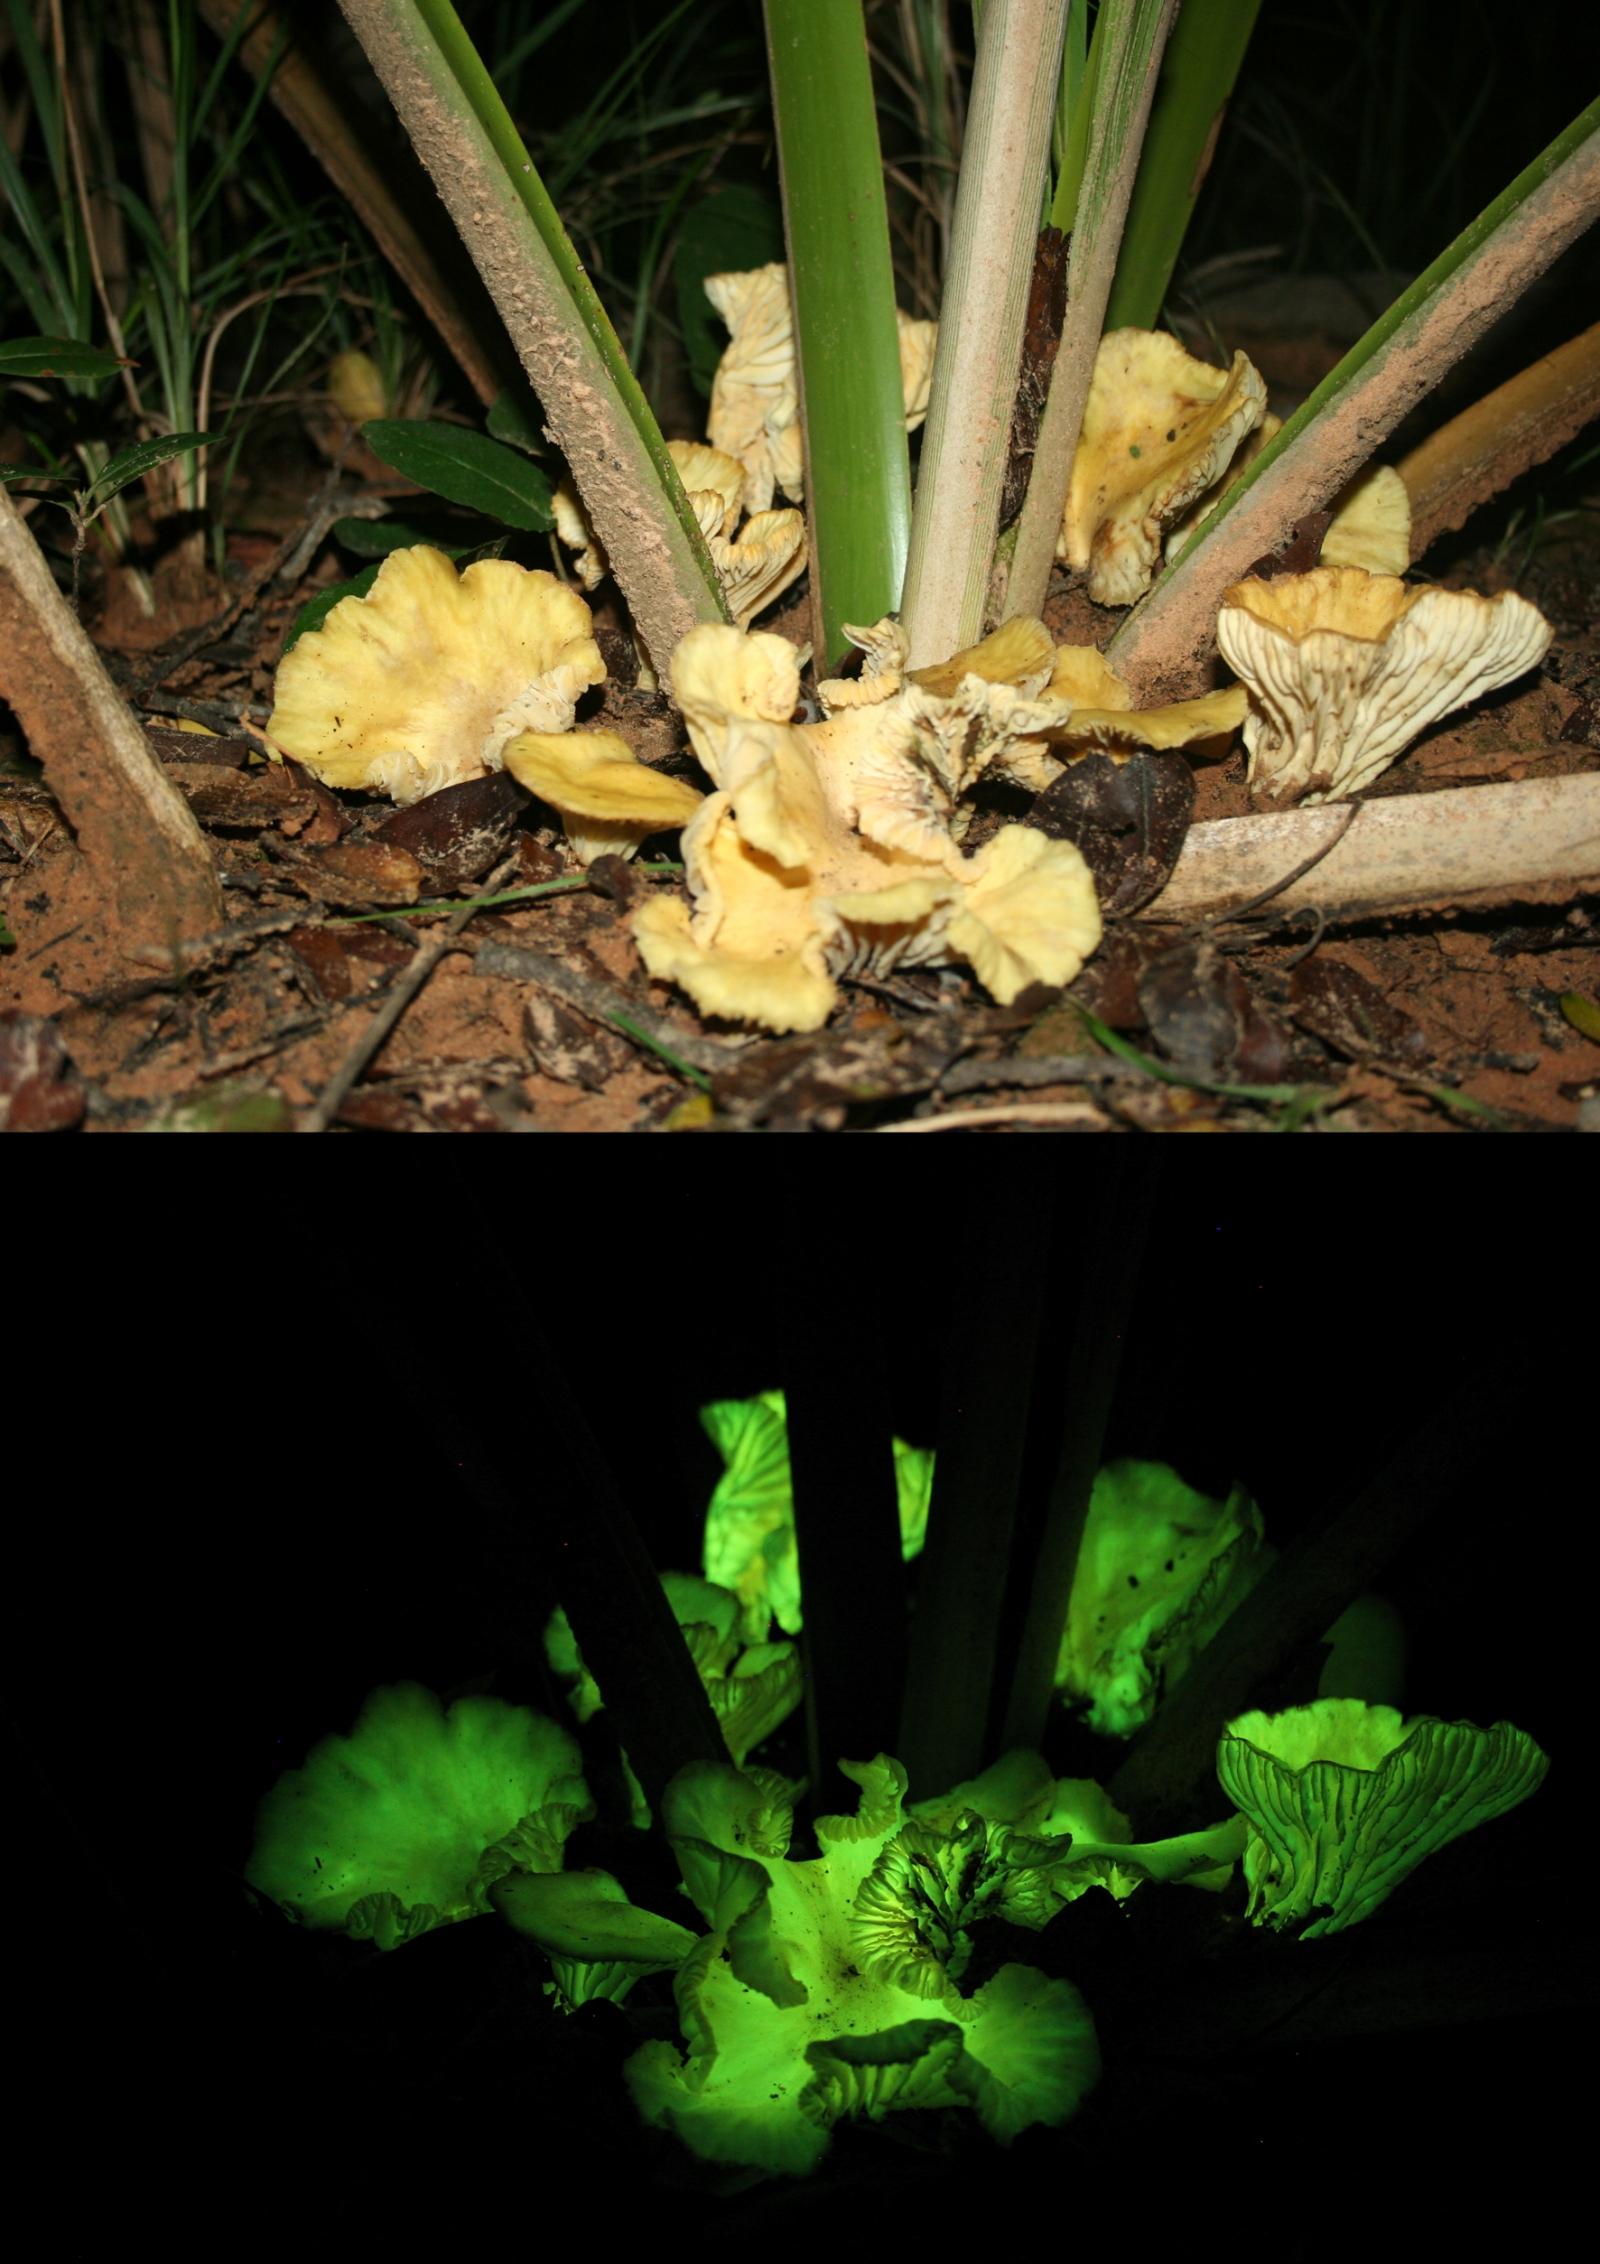 Glow-in-the-dark mushroom